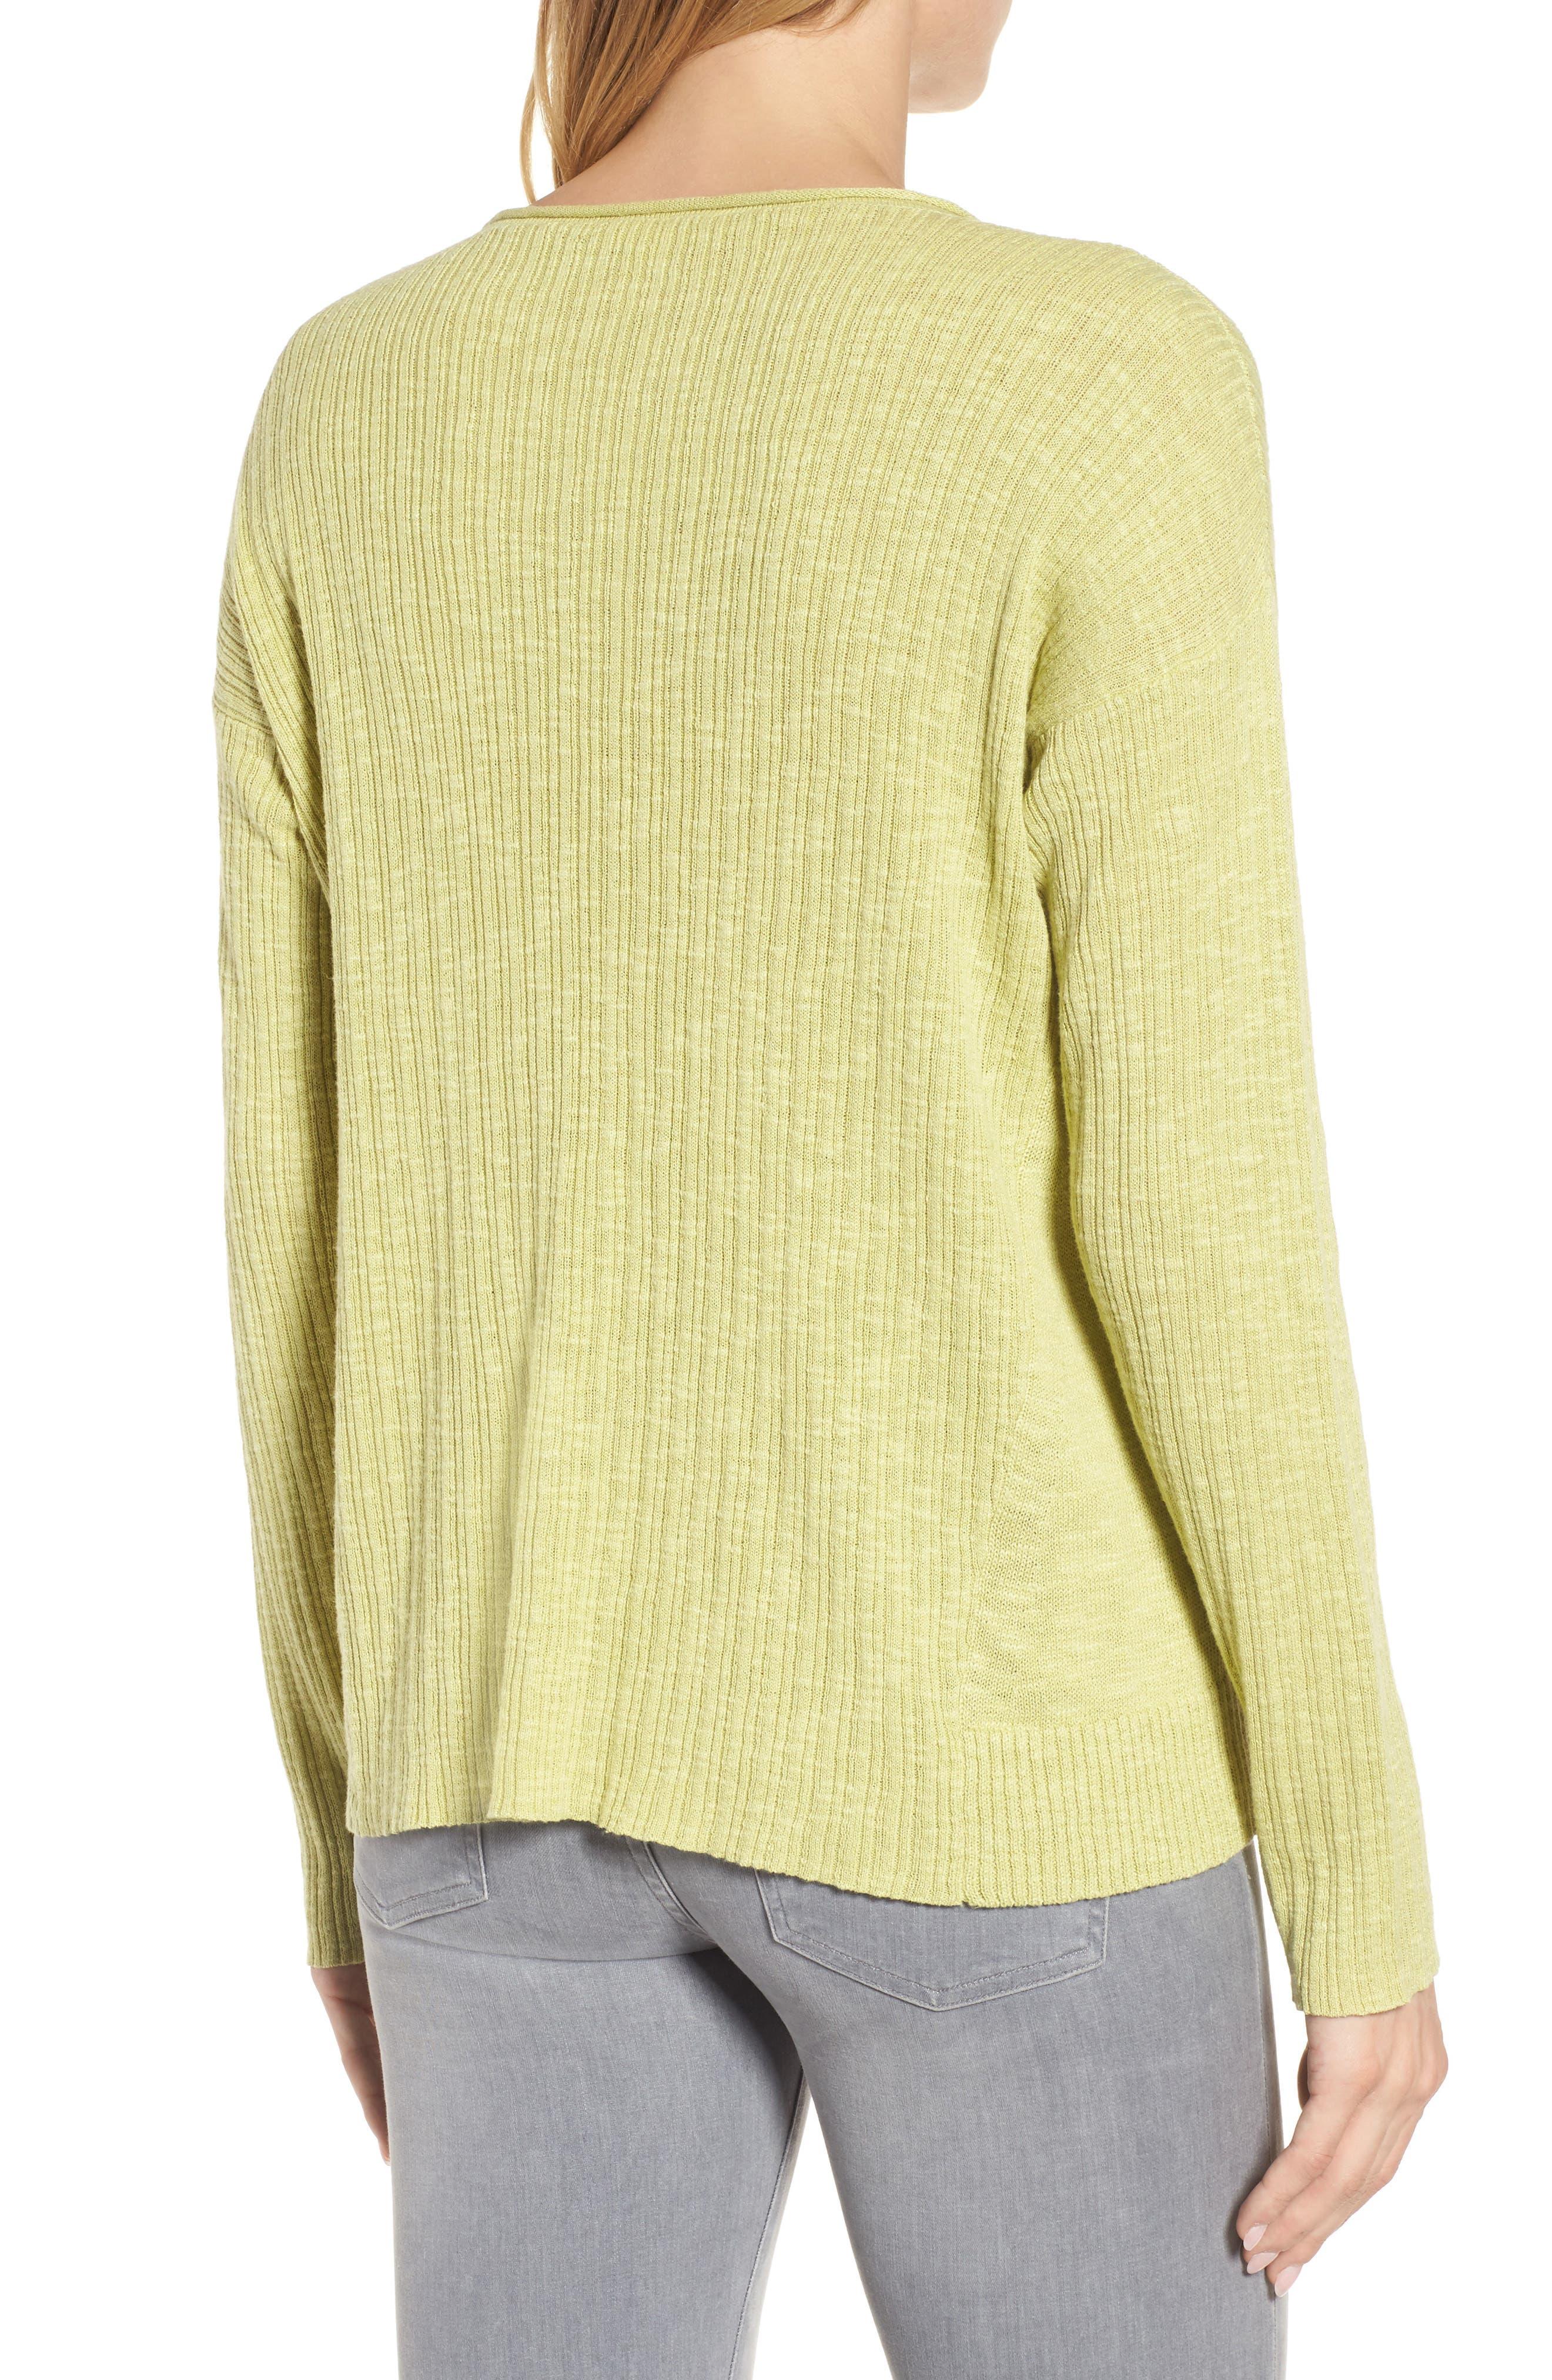 Alternate Image 2  - Eileen Fisher Organic Linen & Cotton Crewneck Sweater (Regular & Petite)